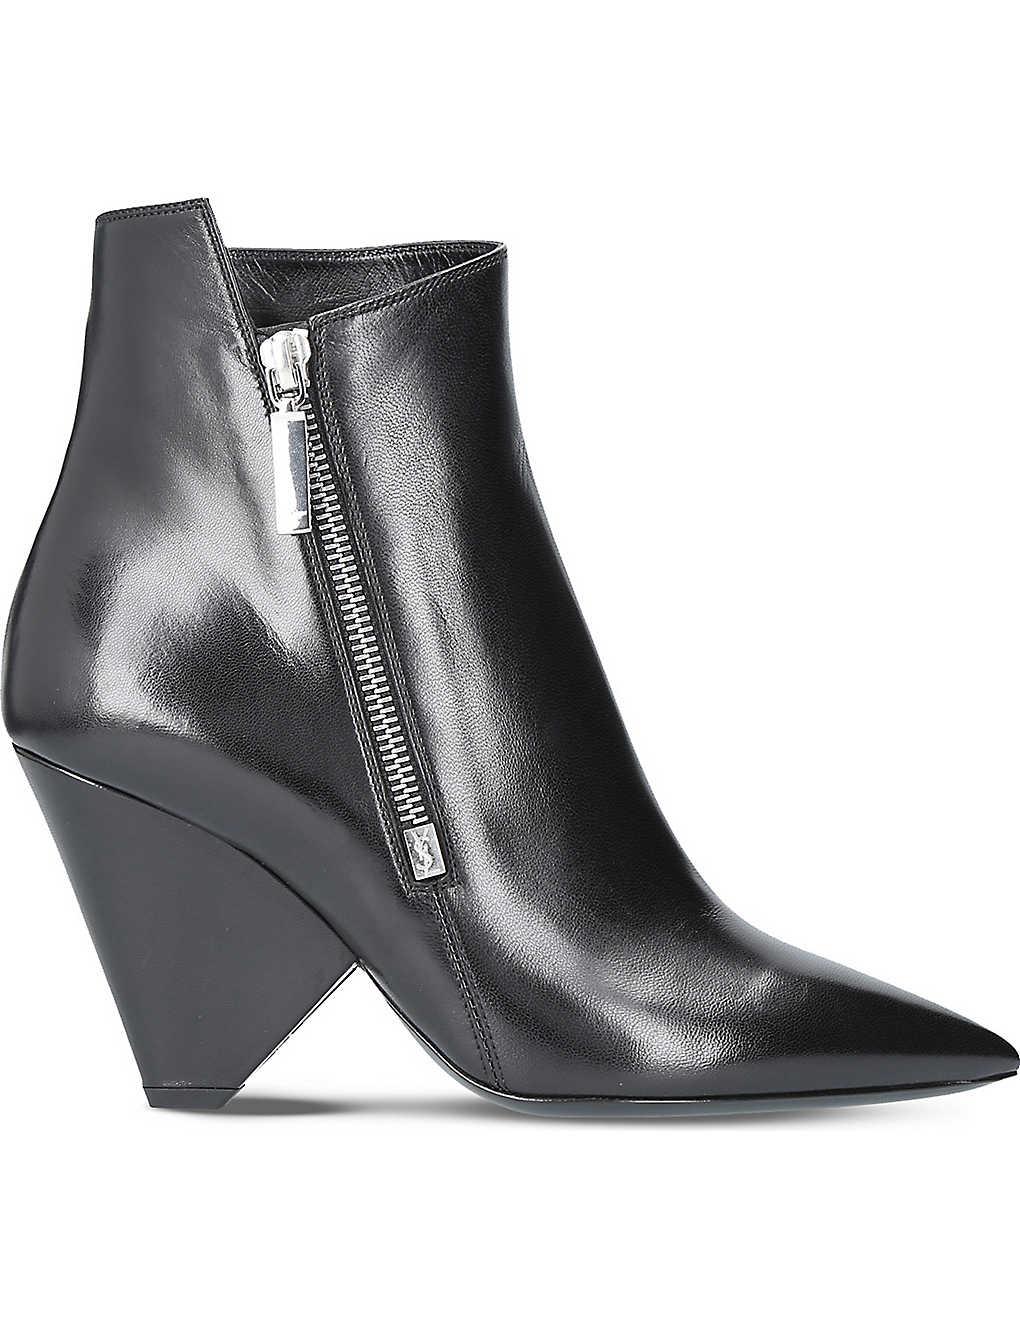 873a5b03c7b SAINT LAURENT - Niki 85 leather heeled ankle boots   Selfridges.com